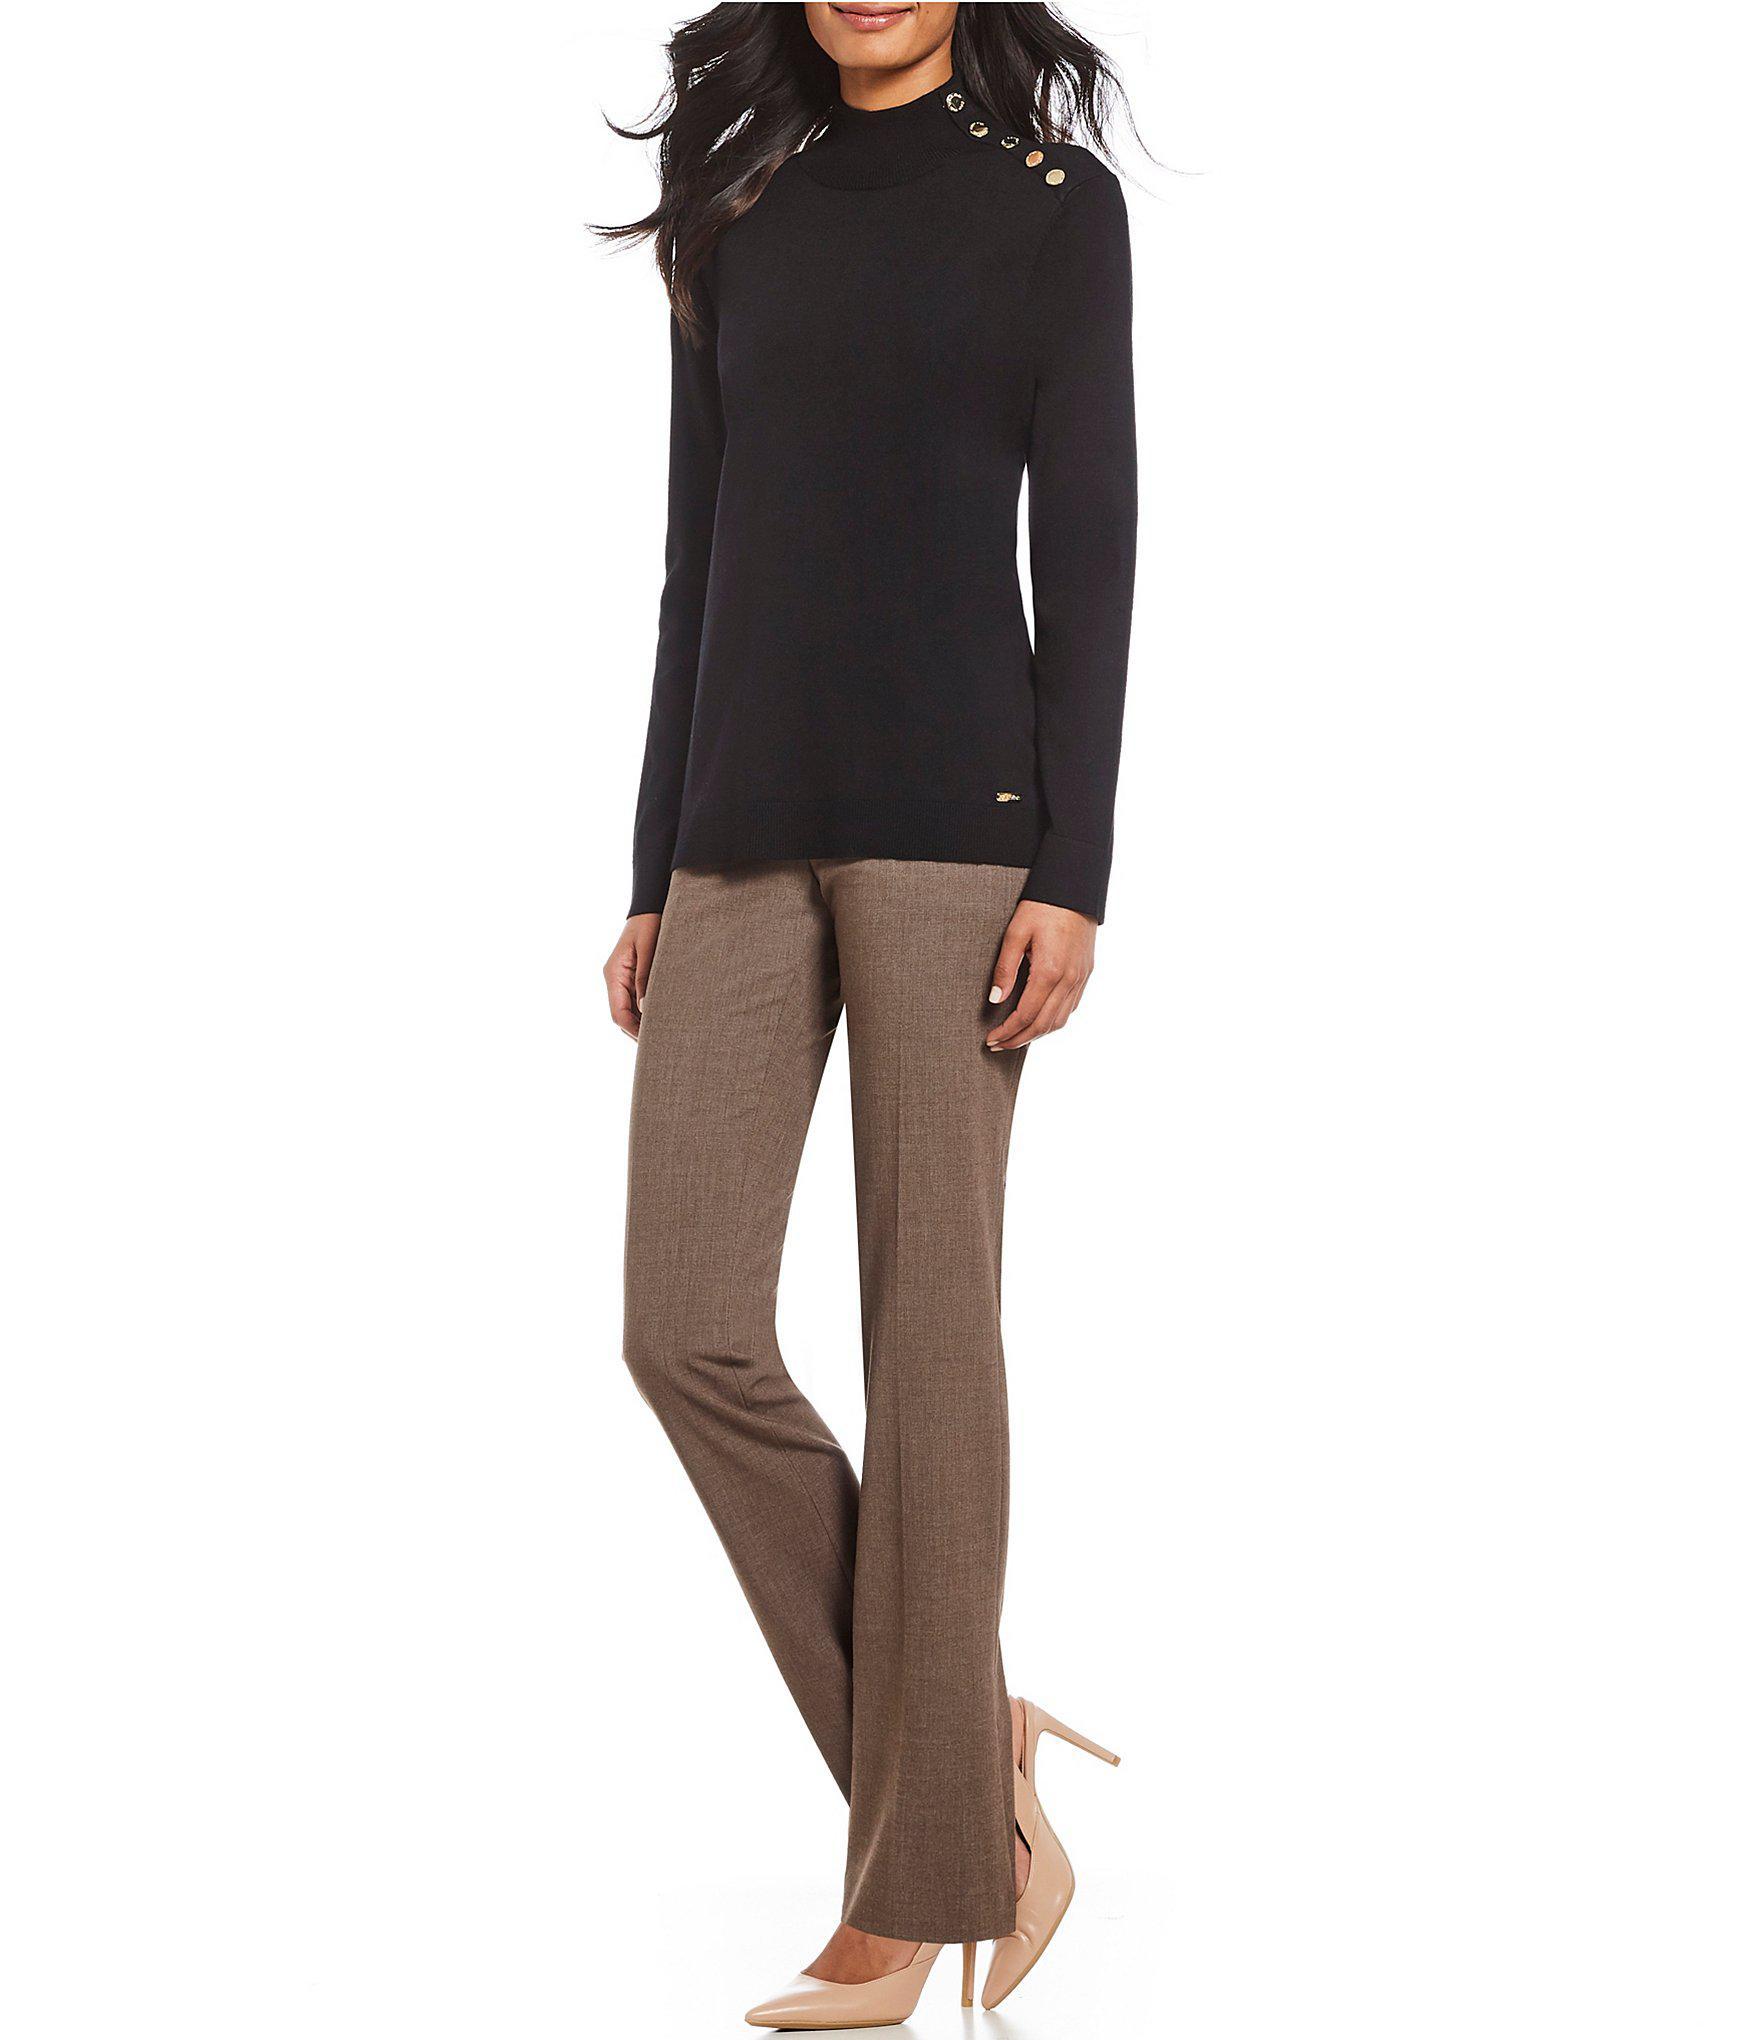 f6f96647d0809 Calvin Klein - Black Button Embellished Shoulder Mock Neck Sweater - Lyst.  View fullscreen